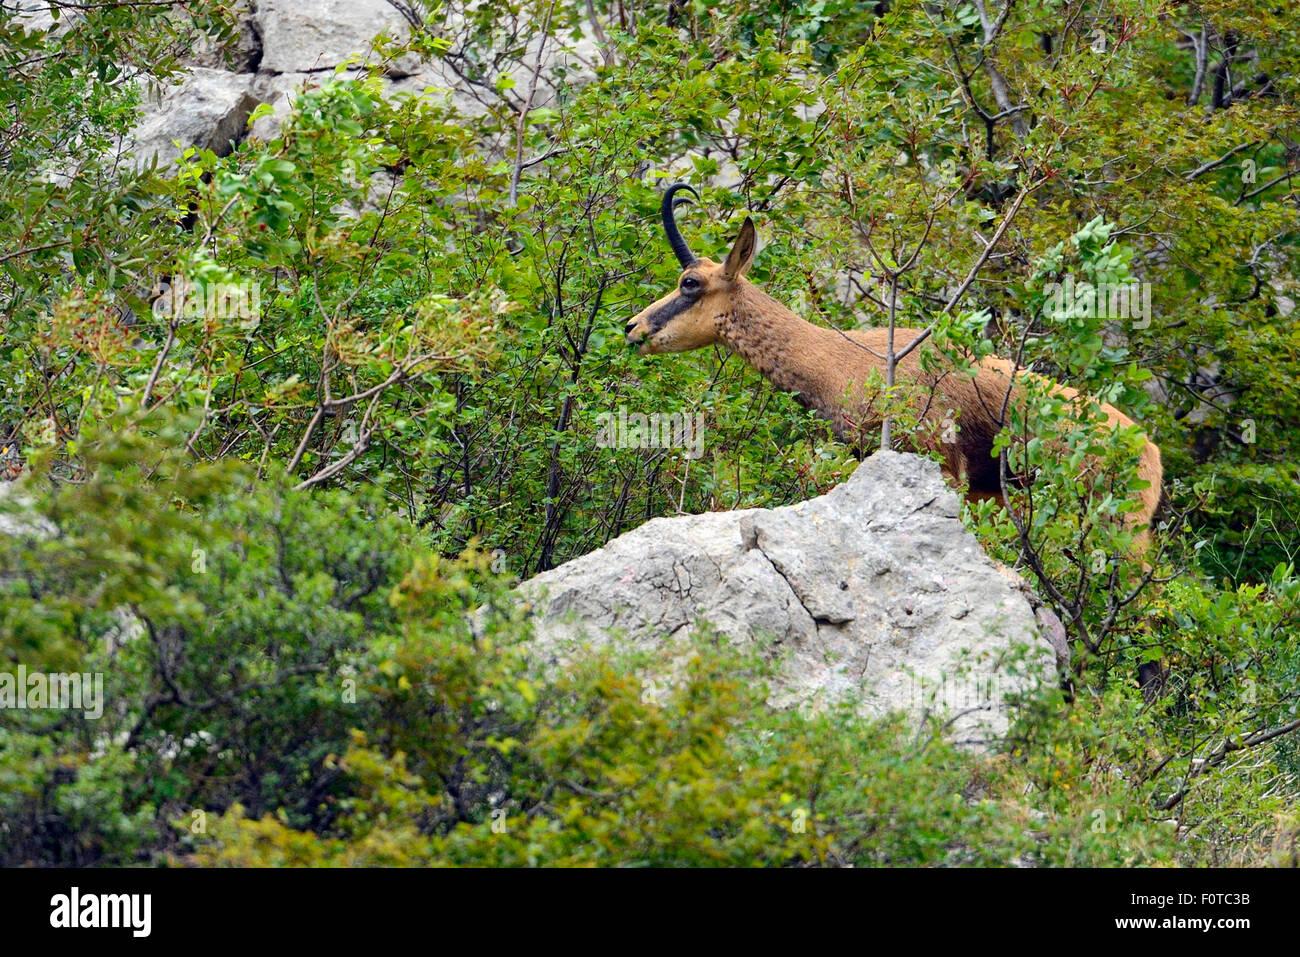 Balkan Chamois (Rupicapra rupicapra balkanica) Gems, Paklenica National Park, Velebit Nature Park, Rewilding Europe Stock Photo